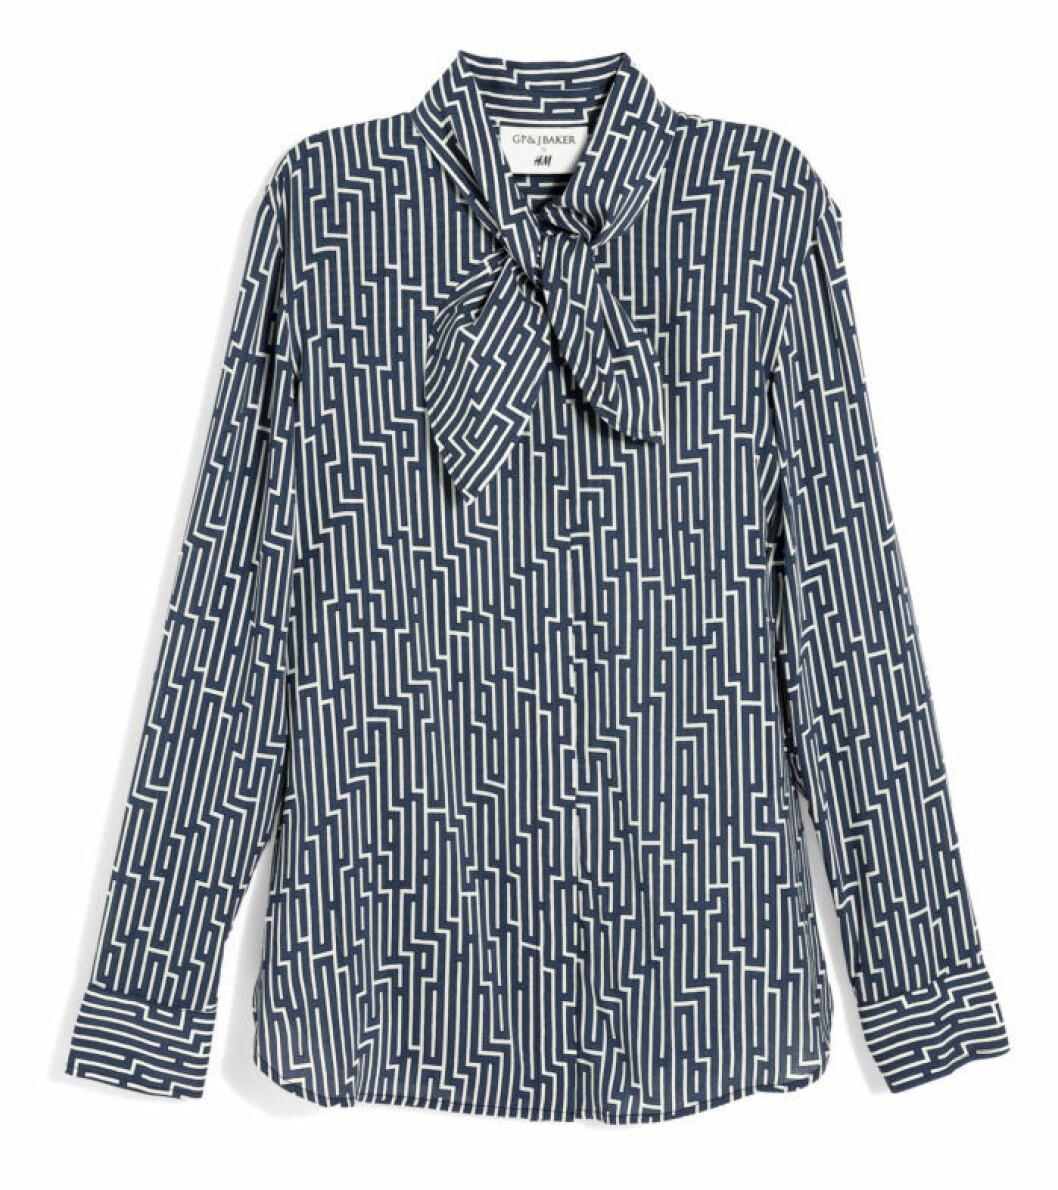 H&M GP & J Baker geometrisk mönstrad skjorta